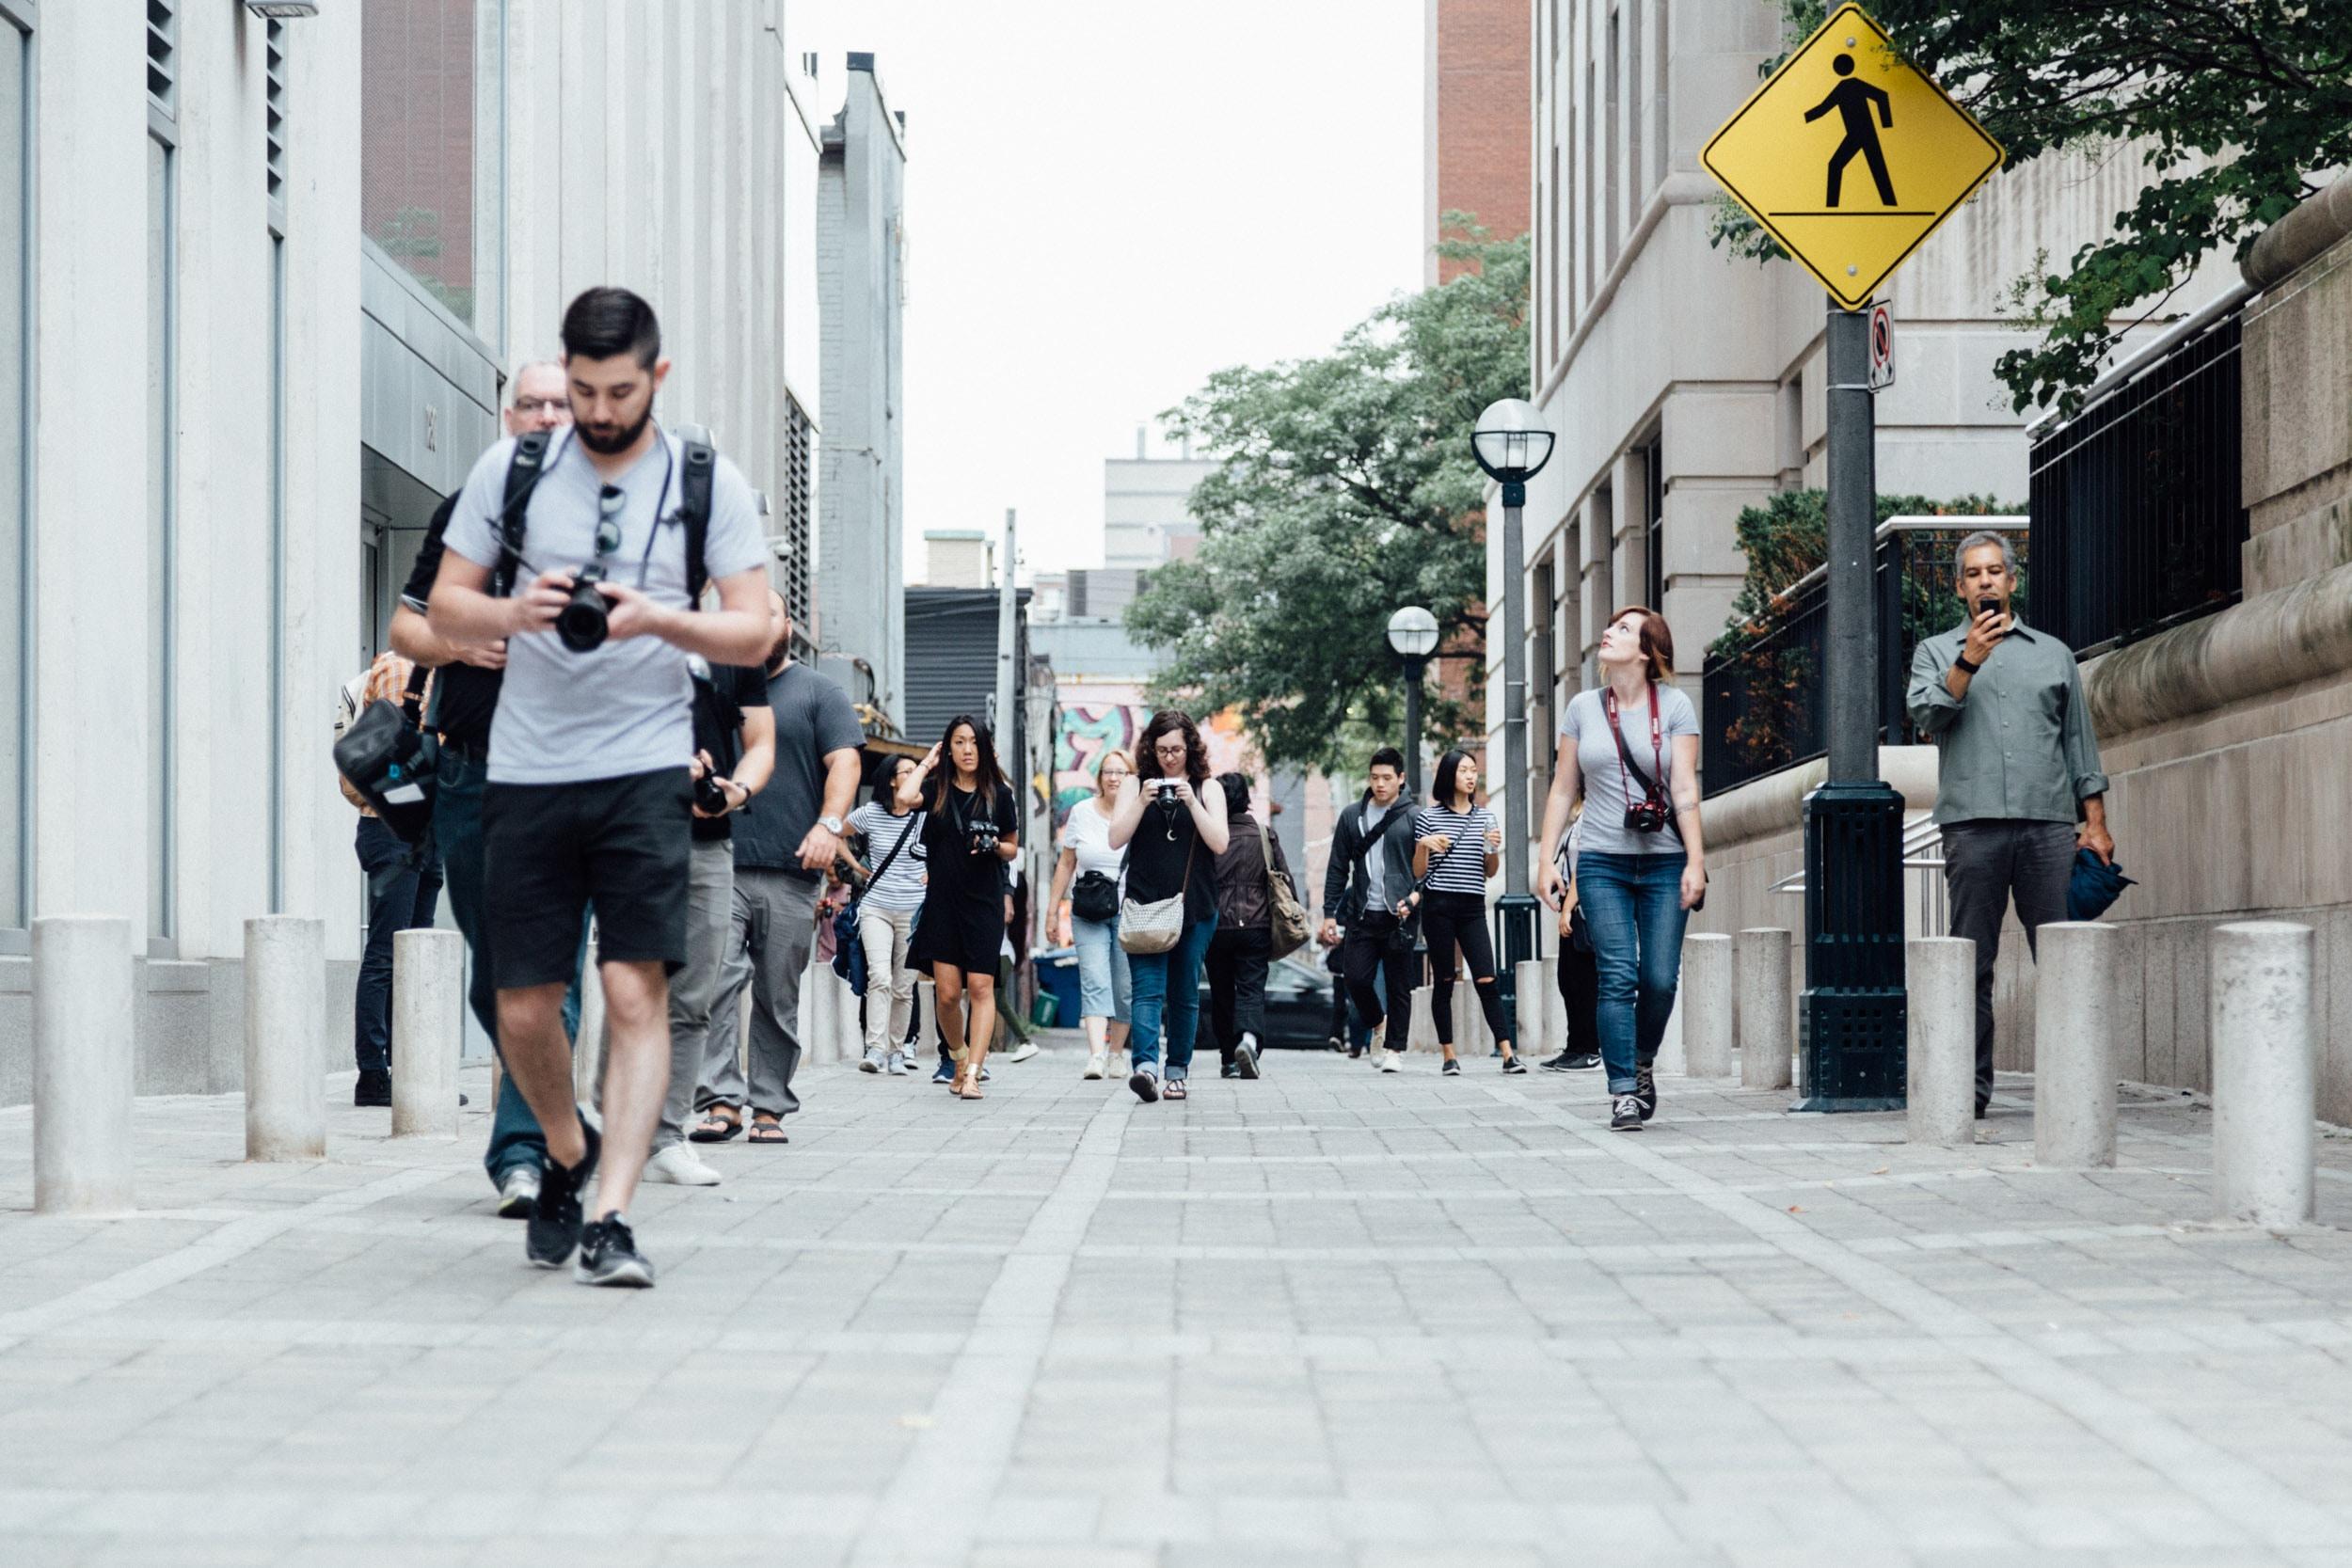 A diverse group of pedestrians walks down a sidewalk in Toronto